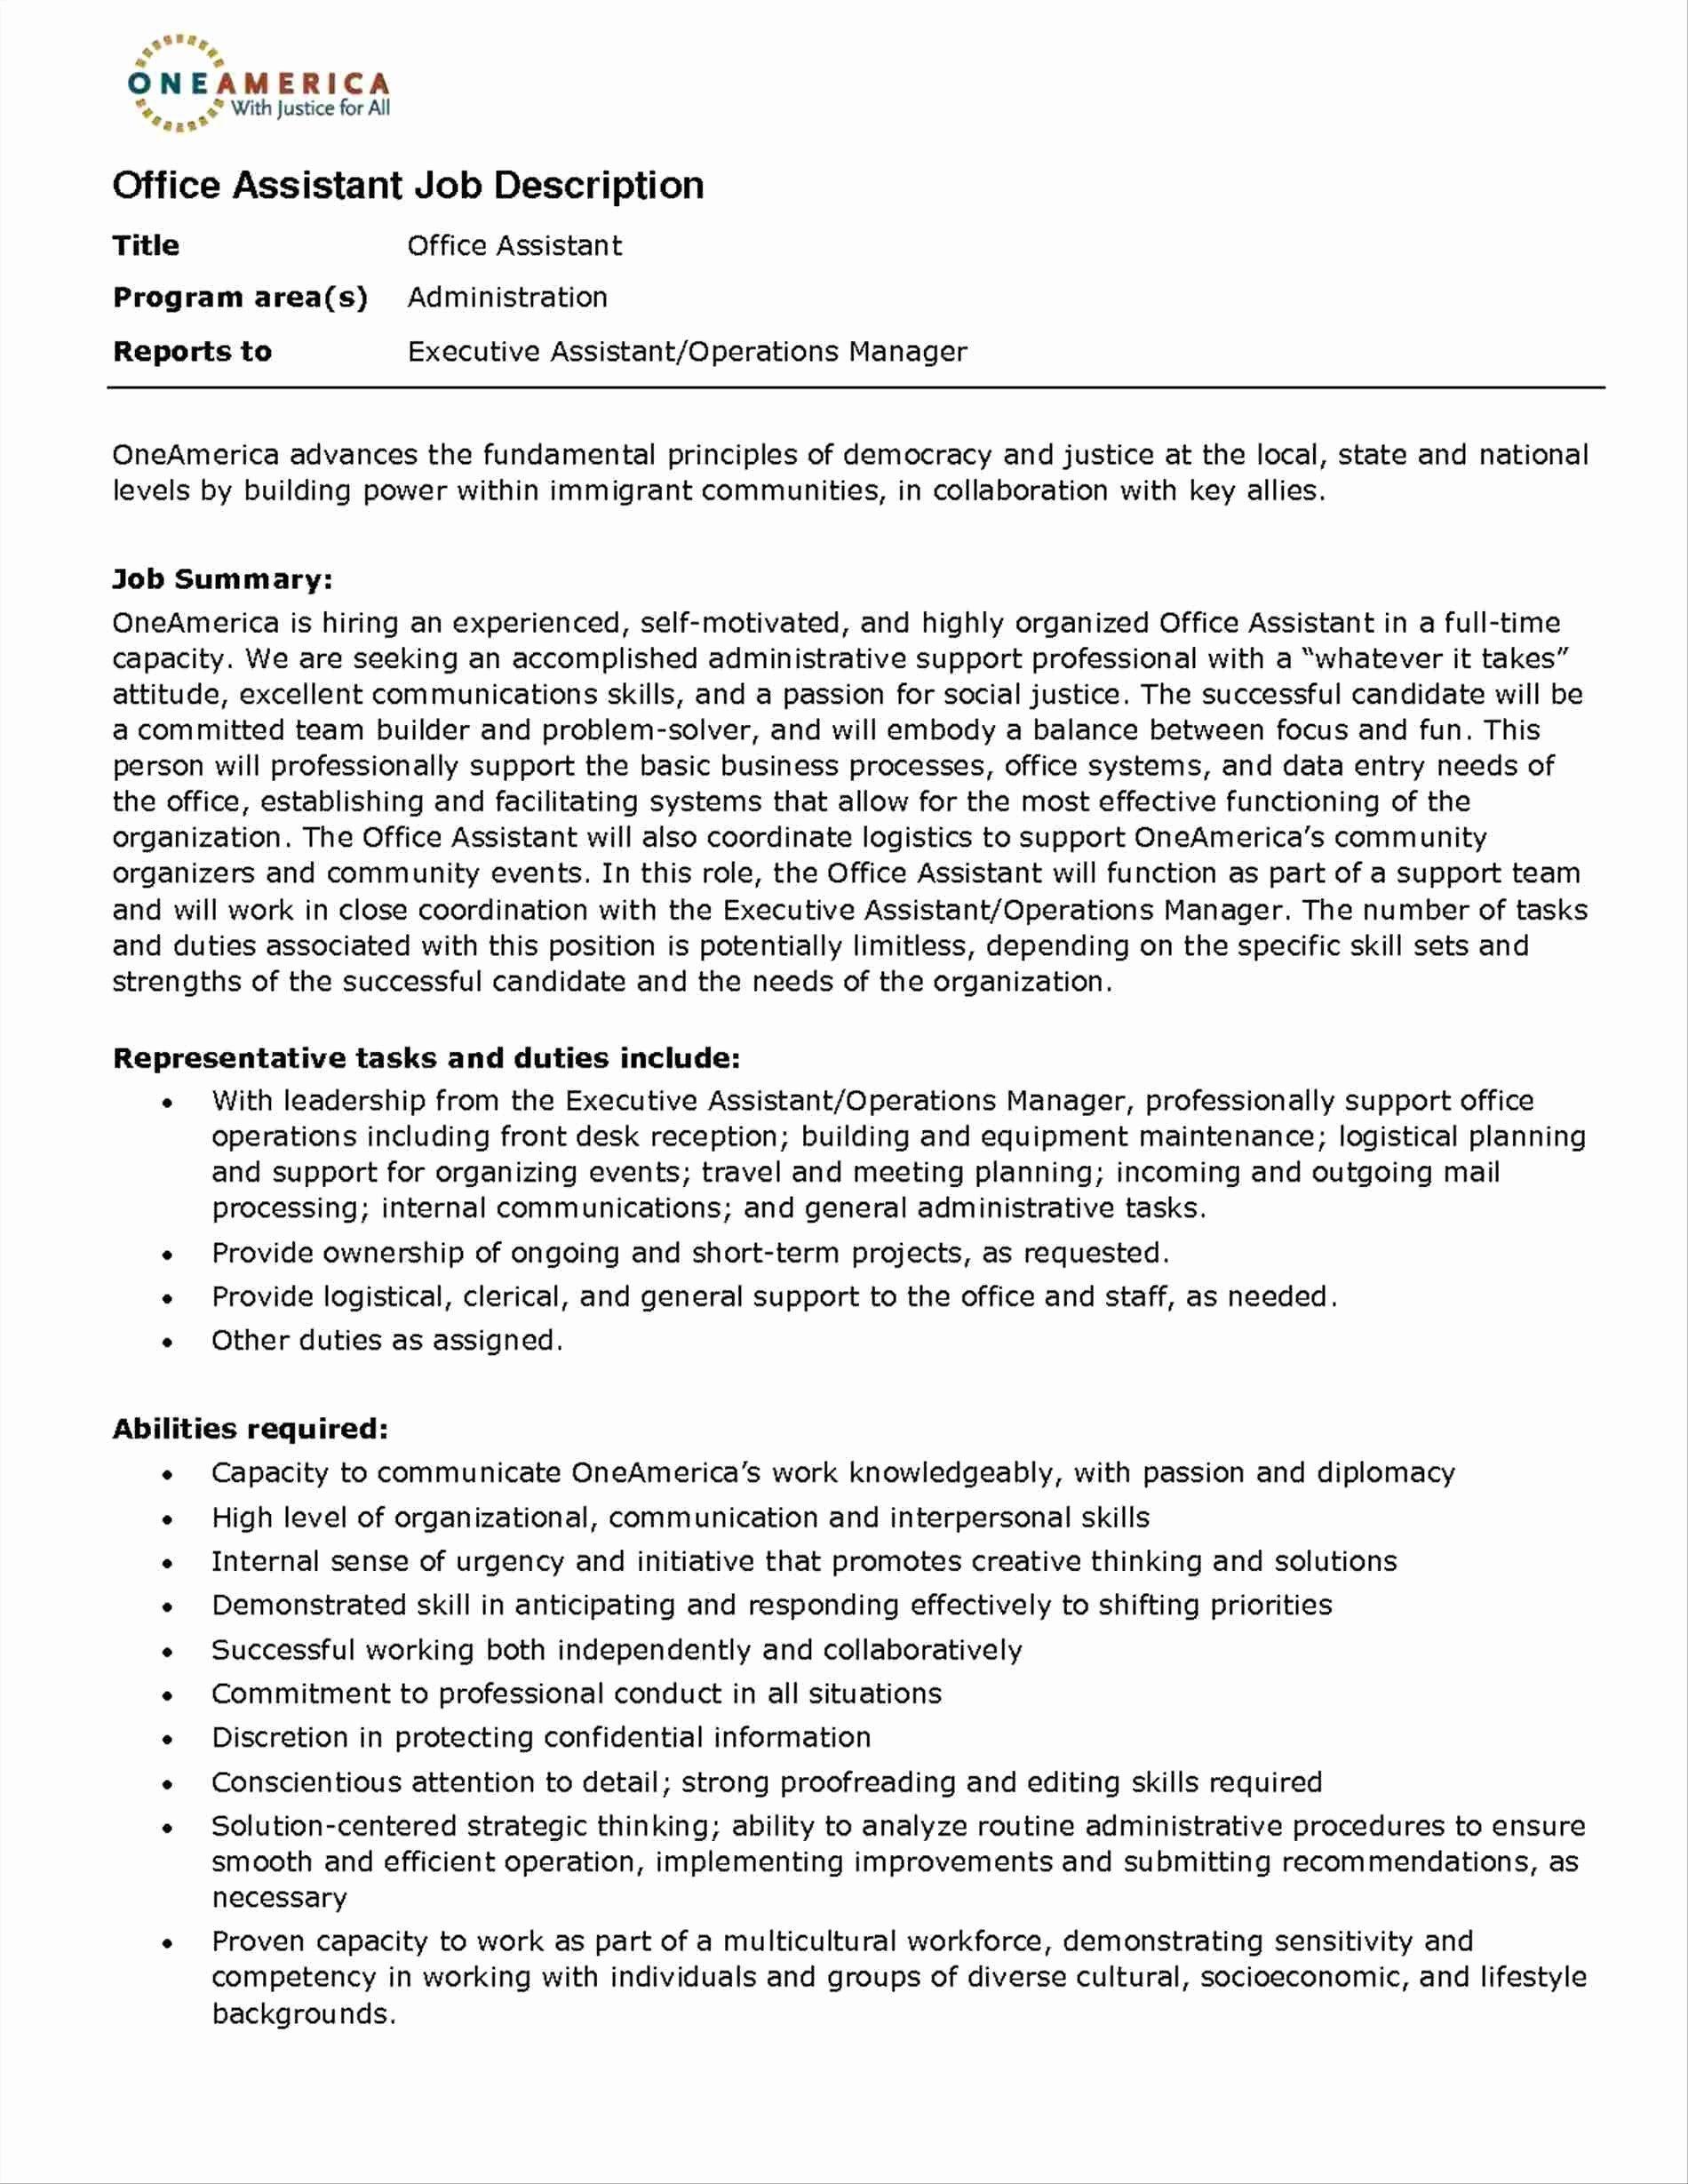 Admin assistant Job Description Resume Fresh 10 Office